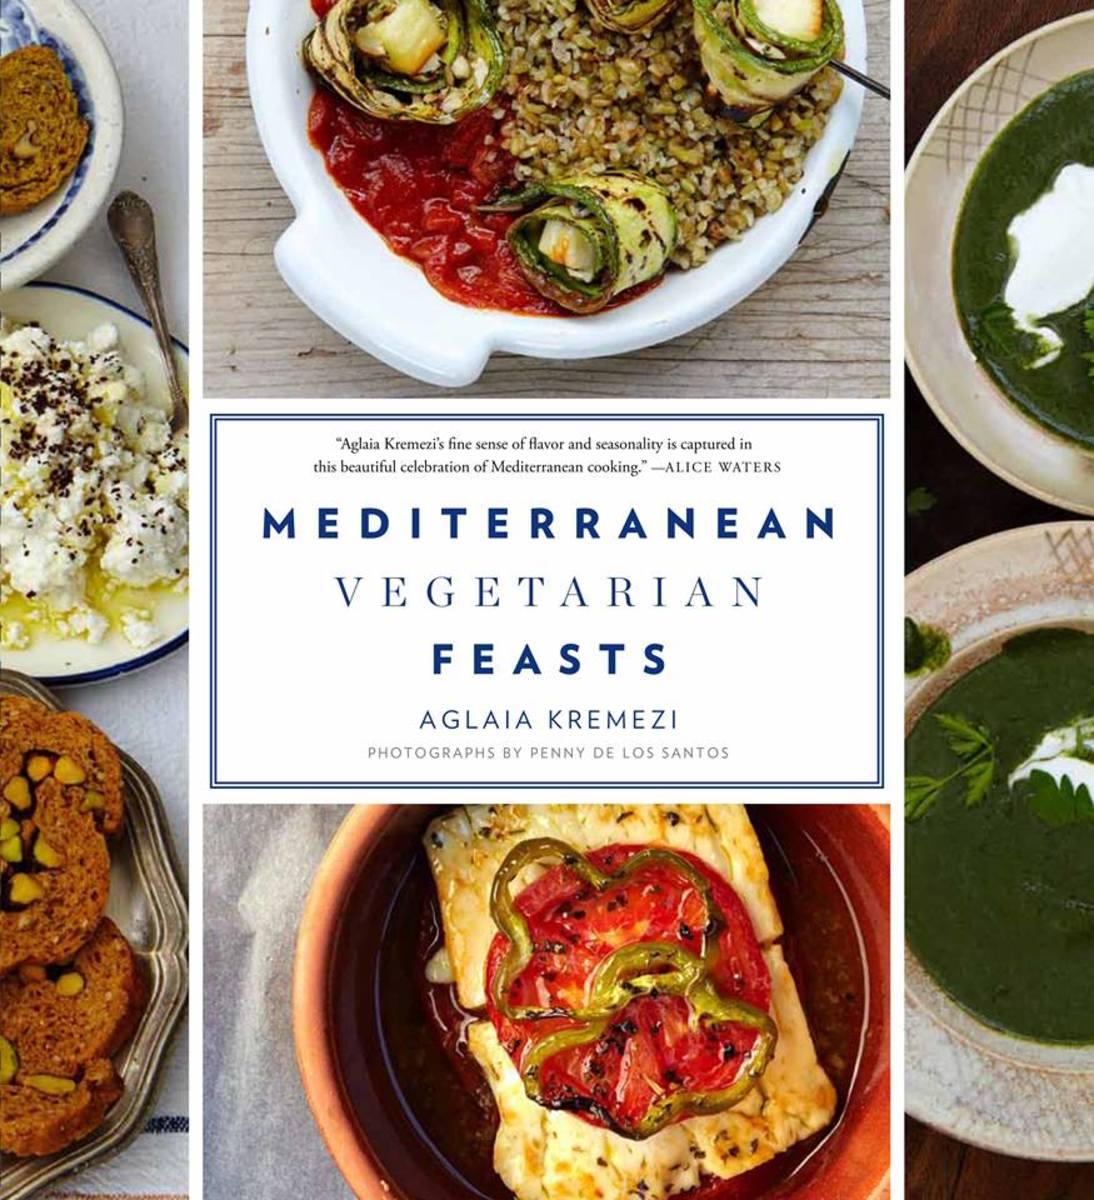 Meat-Free Vegetarian Greek Food Exists? Oh Yes